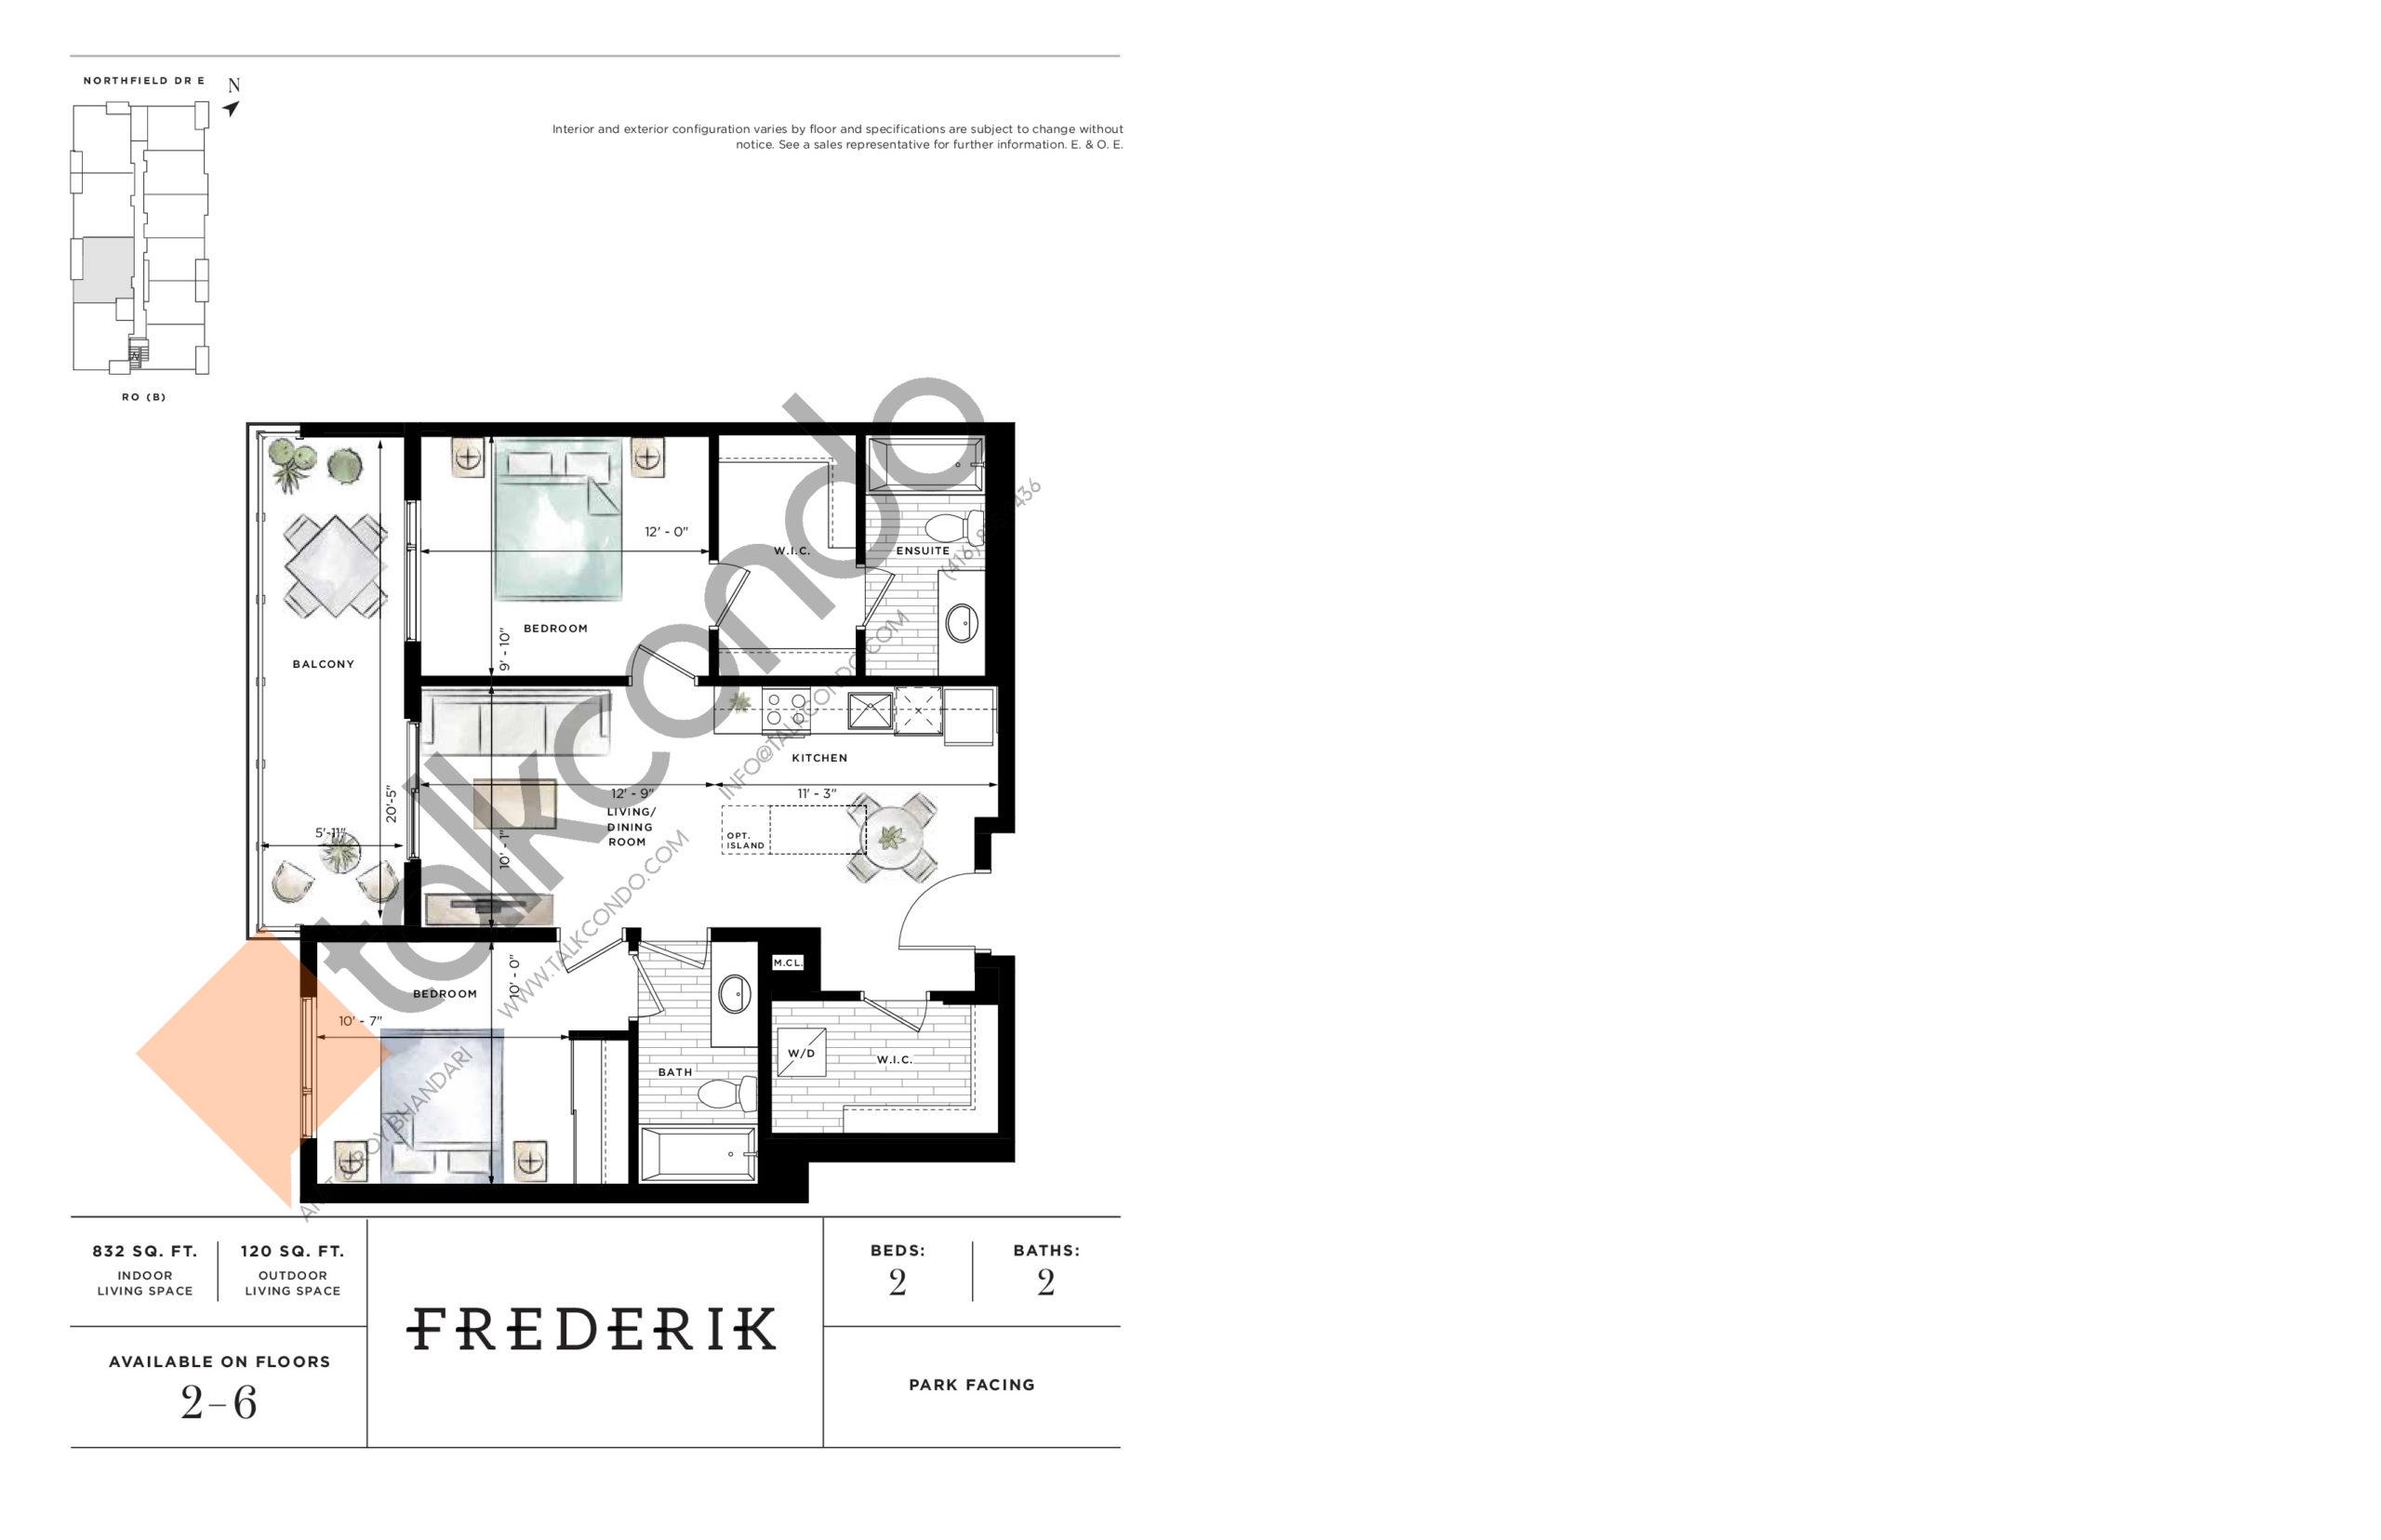 Frederik Floor Plan at Ro at Blackstone Condos - 832 sq.ft